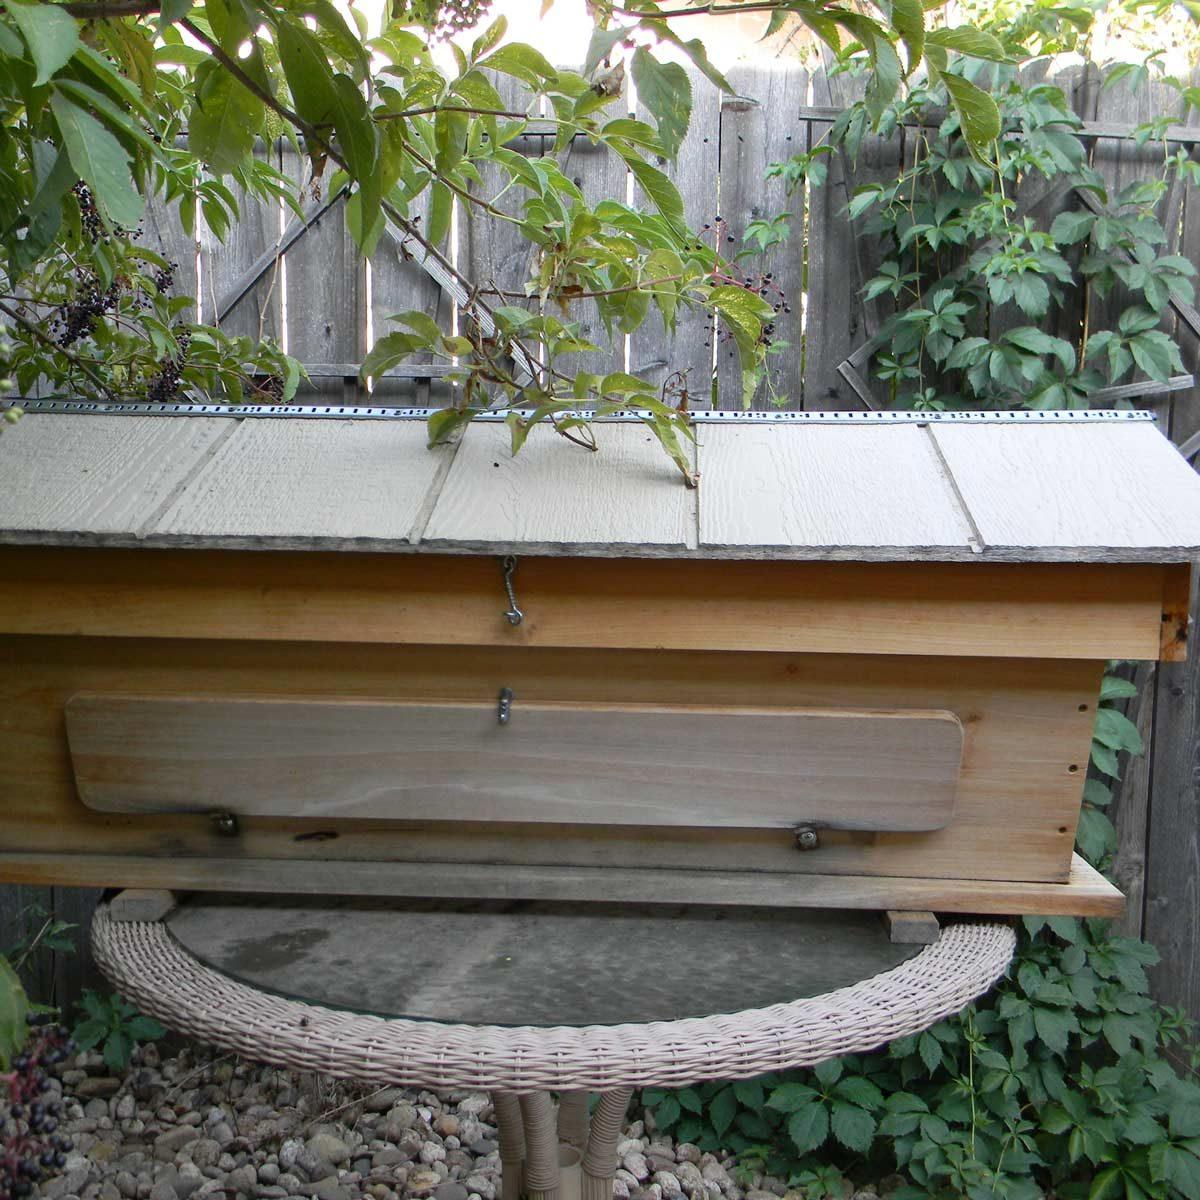 Top Bar Bee Hive